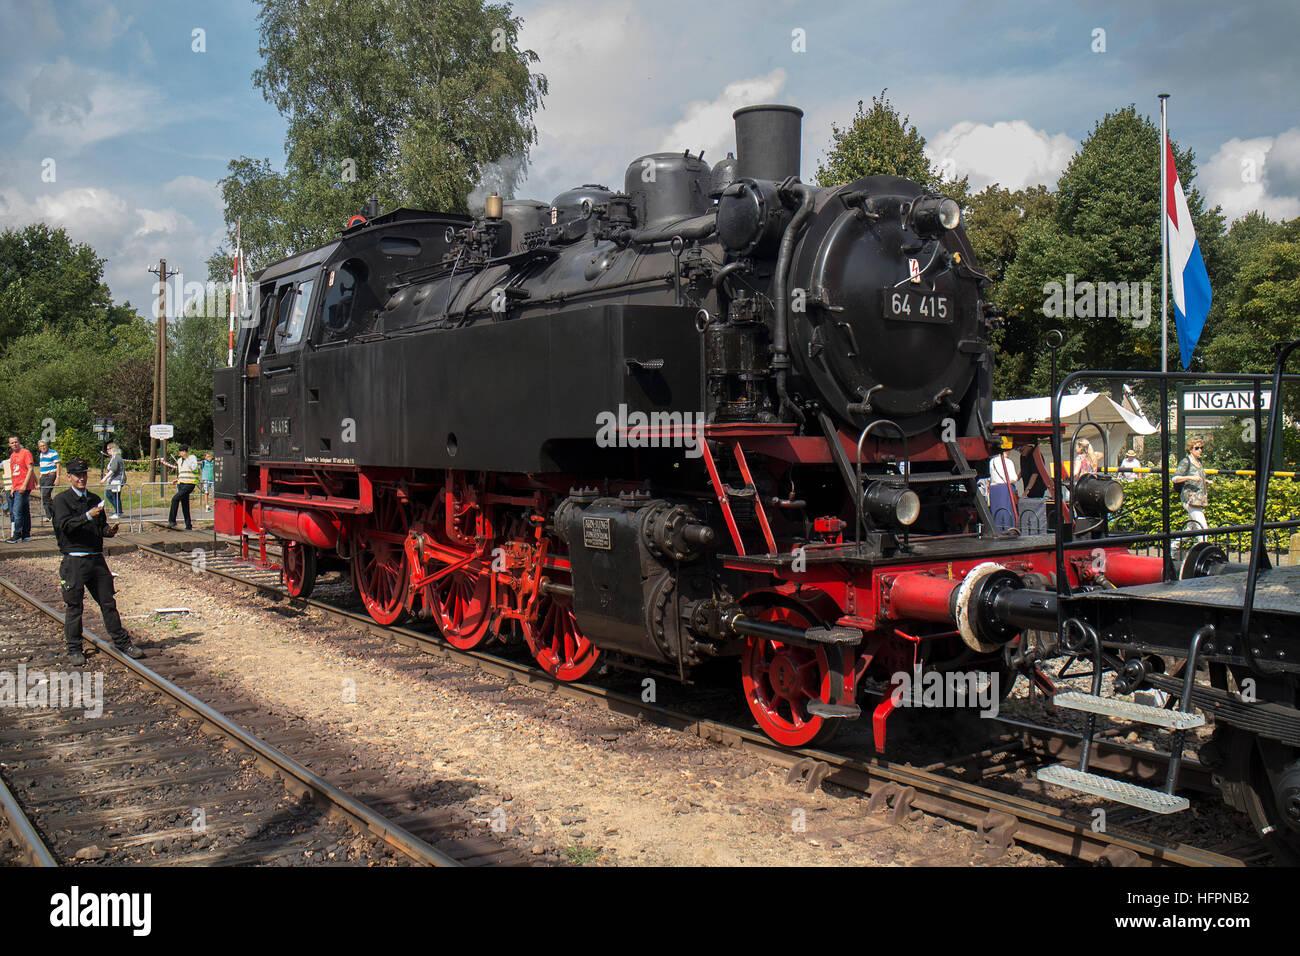 Steam locomotive 64 415 at Beekbergen, Netherlands, at VSM train Festival September 2016 - Stock Image